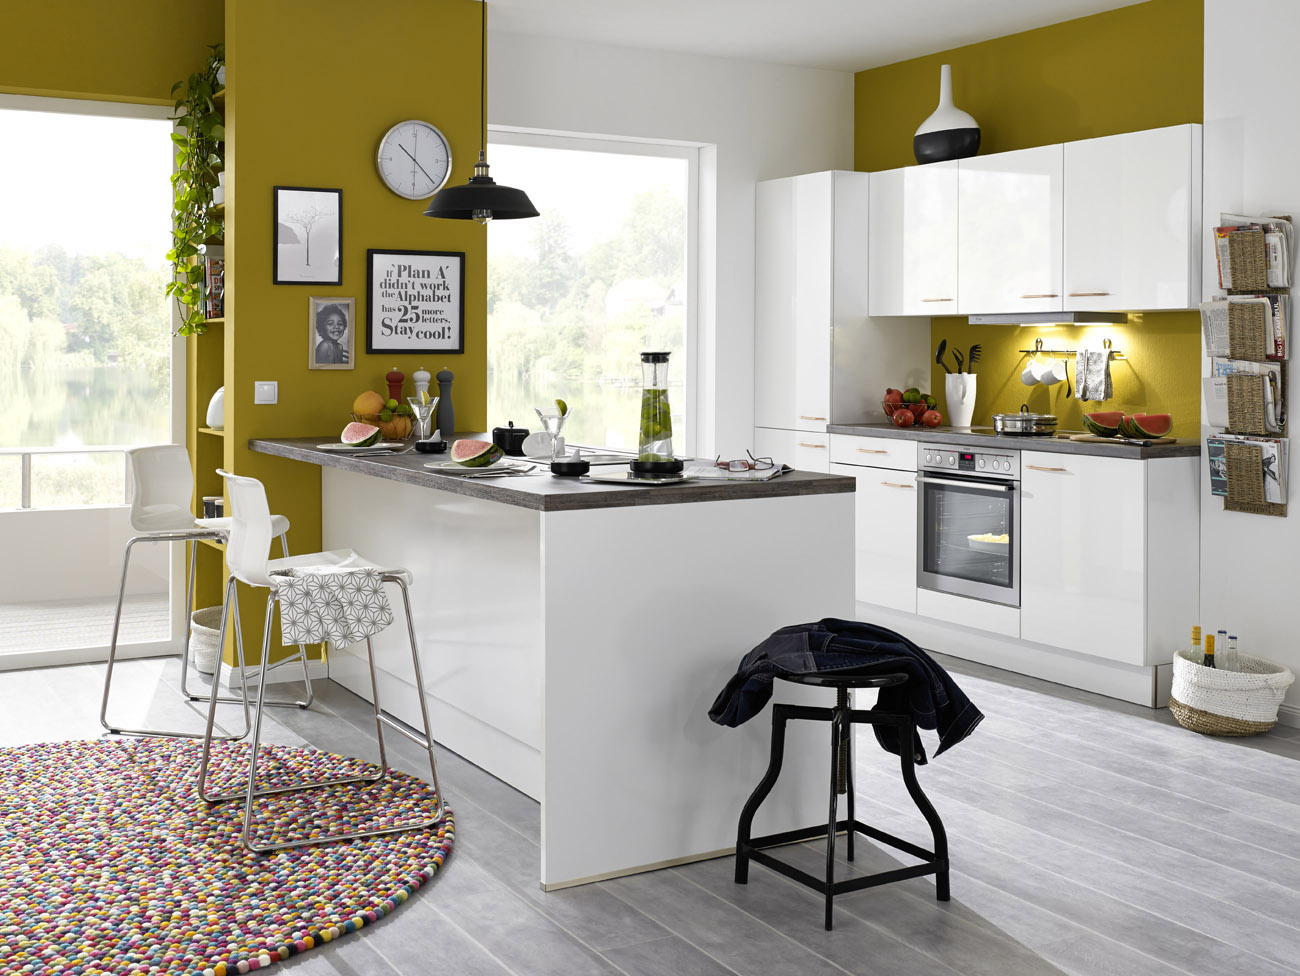 cuisine design blanche good cuisine design blanche with cuisine design blanche fabulous photo. Black Bedroom Furniture Sets. Home Design Ideas